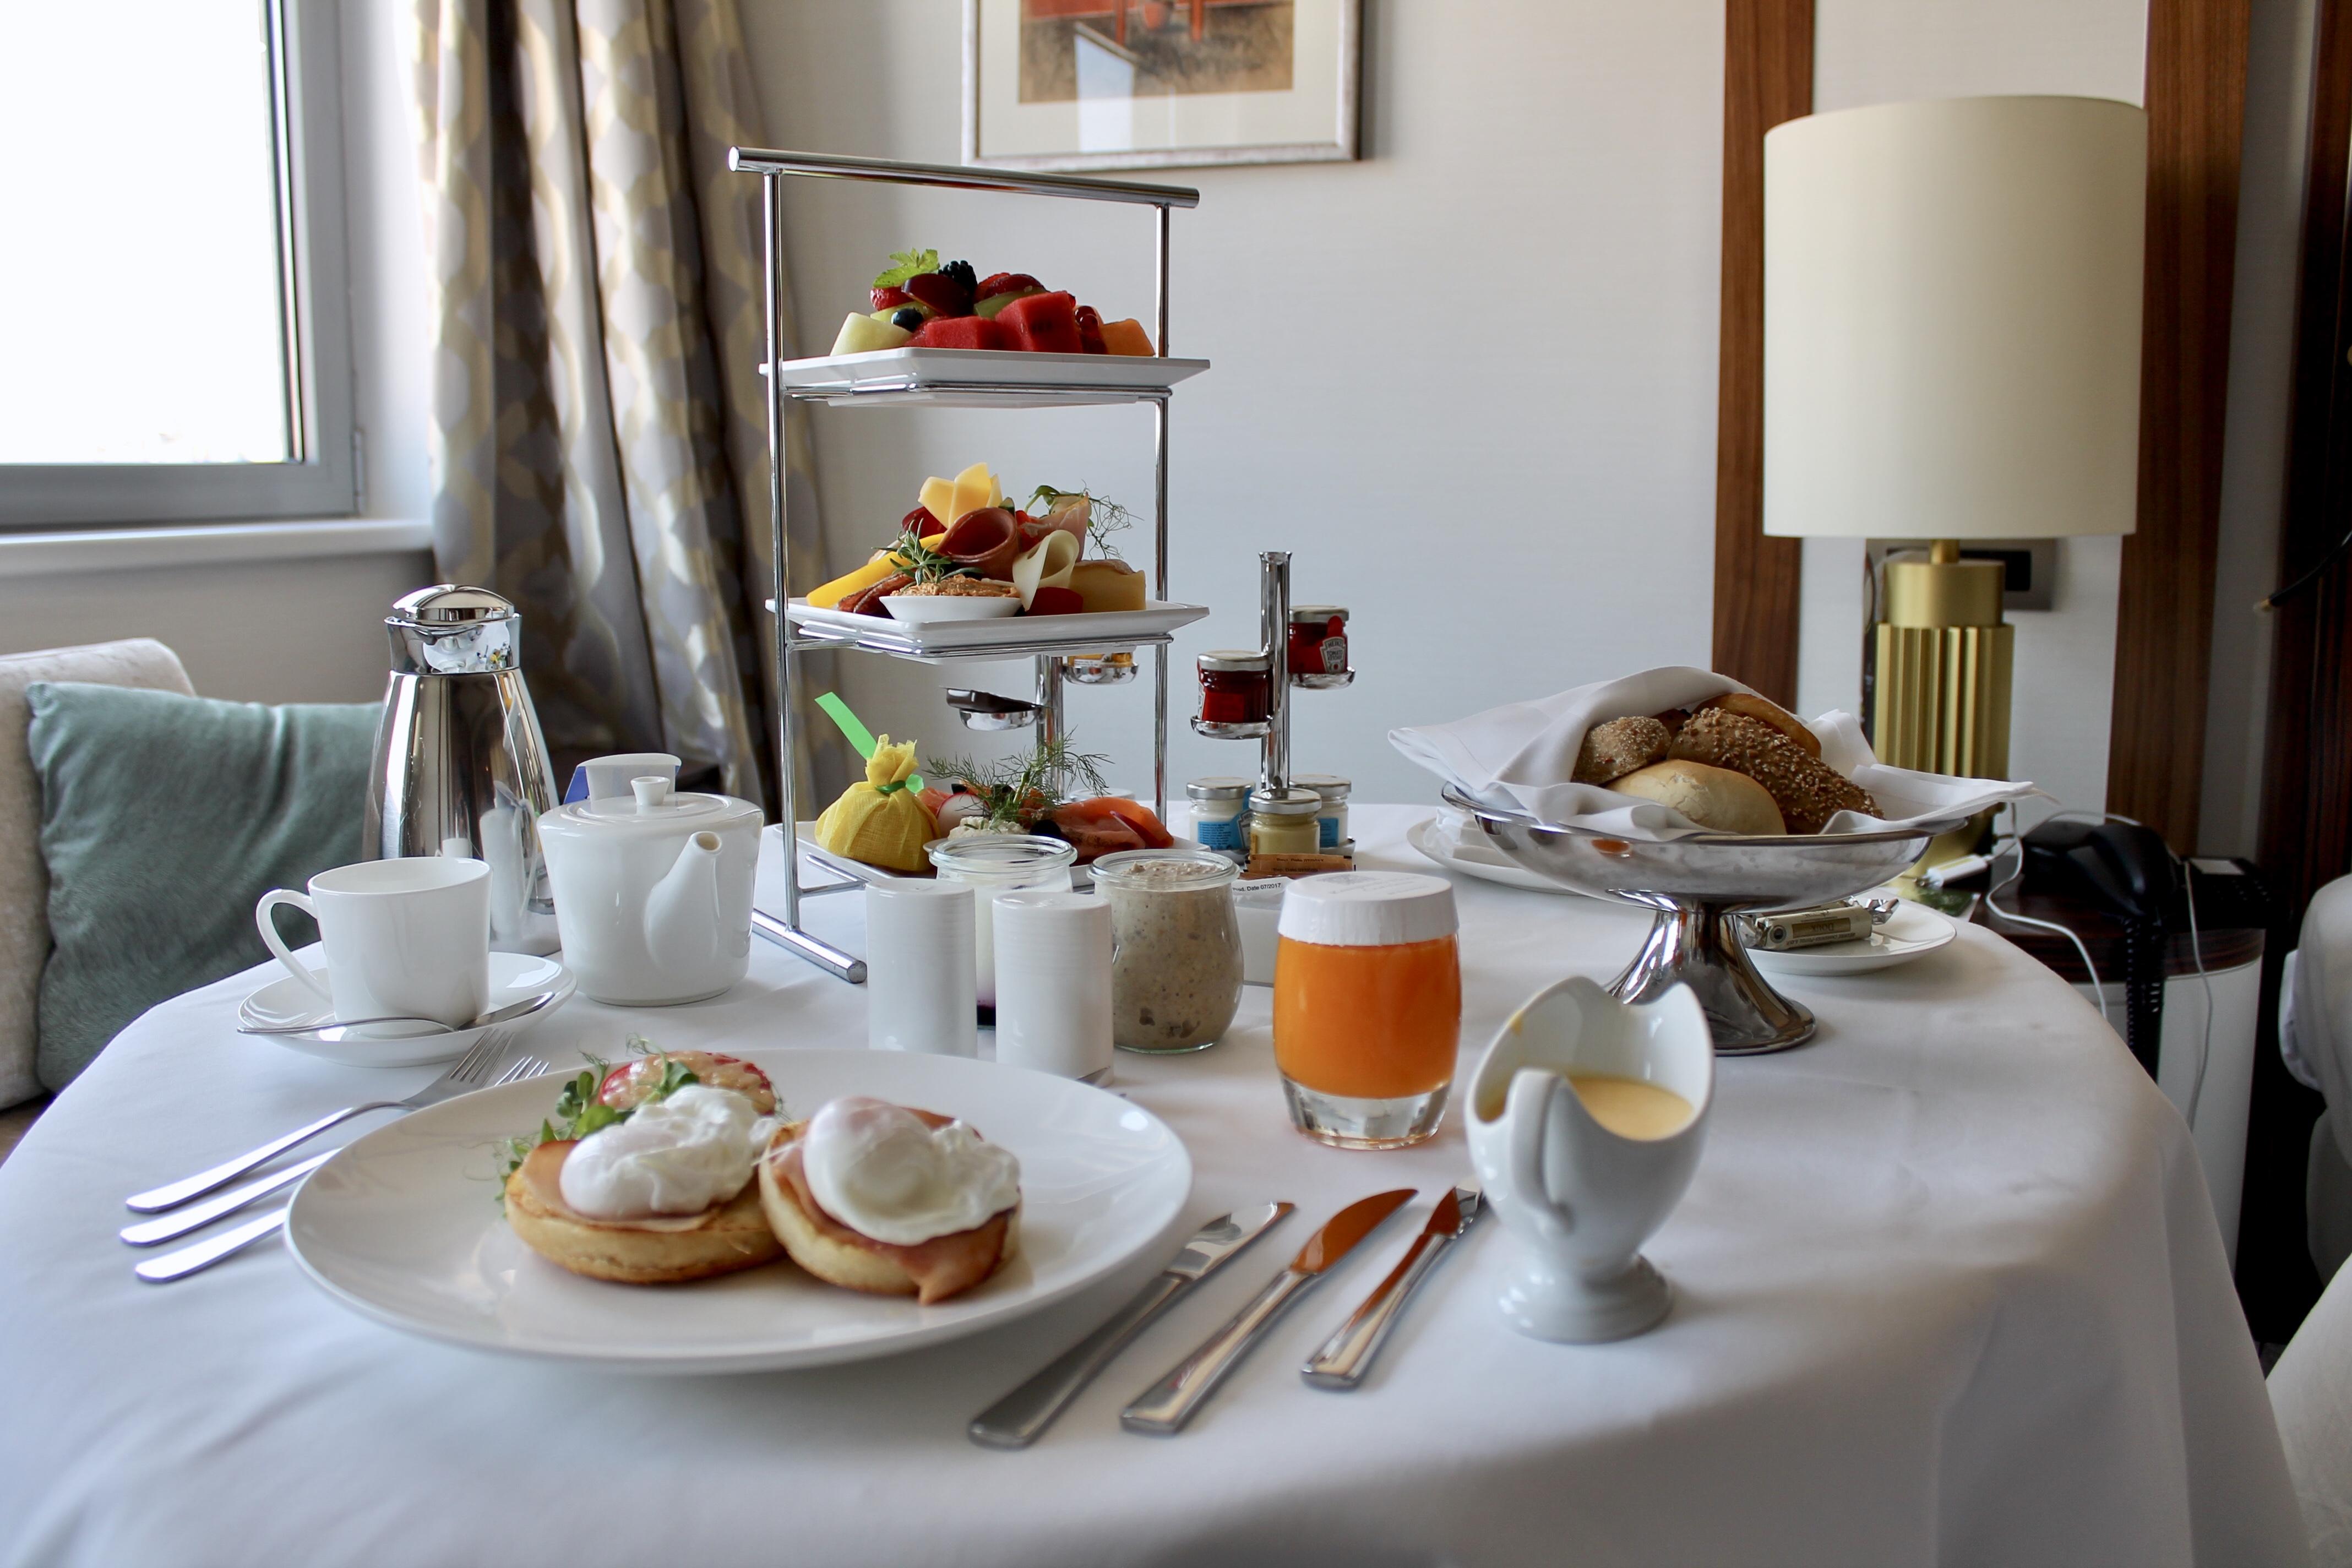 in-room-breakfast-kempinki-hotel-corvinus-budapest-lustforthesublime